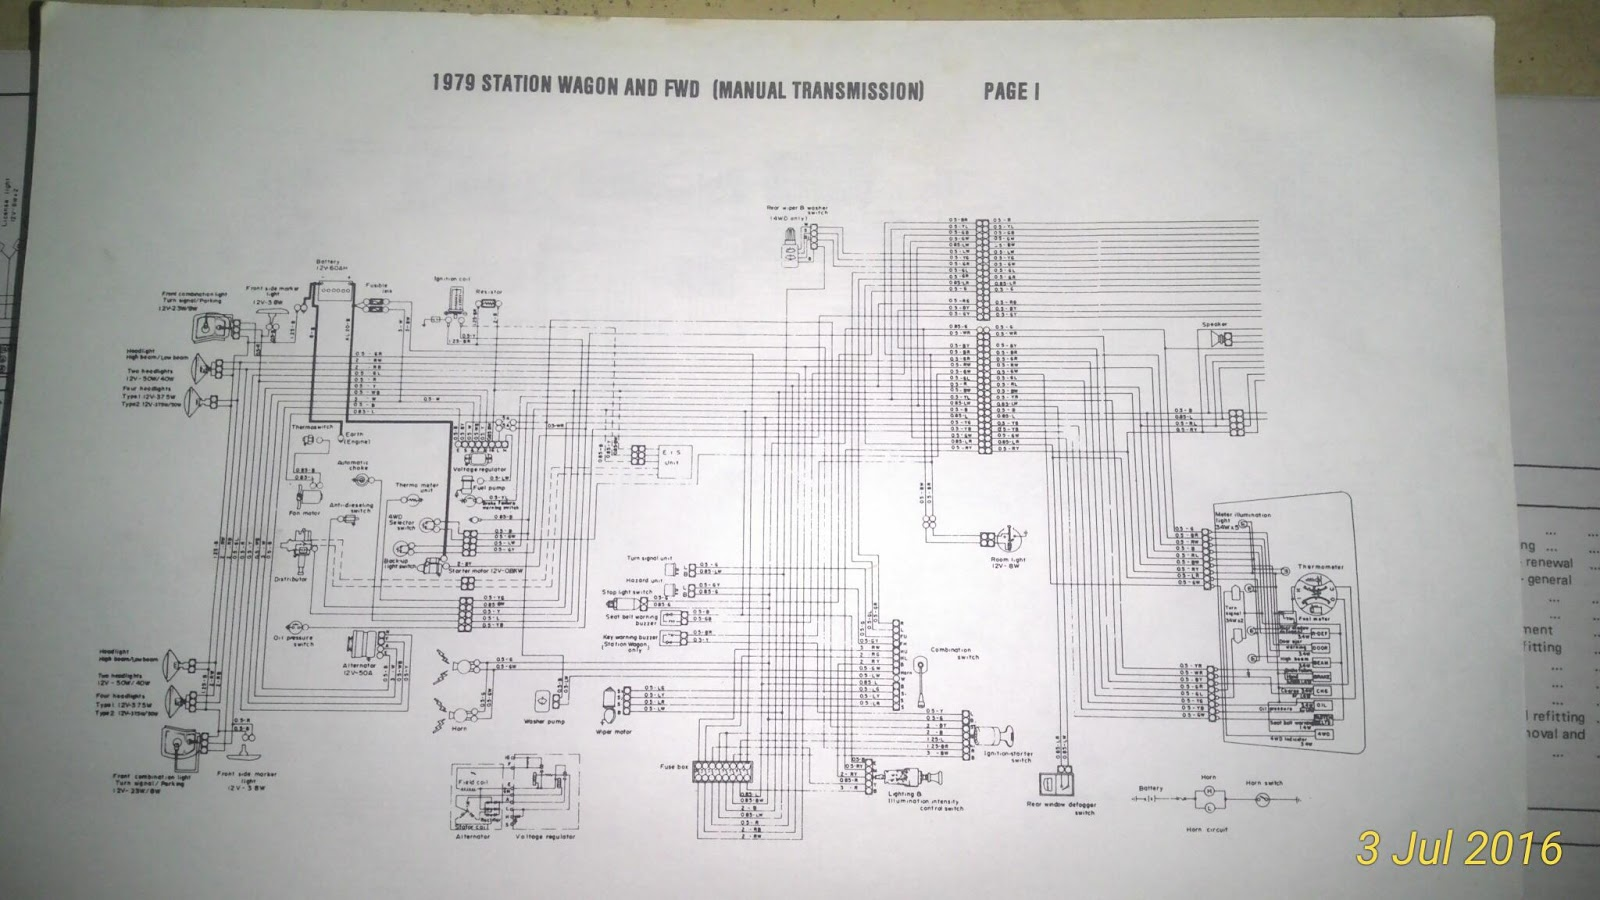 zg_5173] subaru brat wiring diagram download diagram  rosz kargi elae inoma mopar wedab wigeg mohammedshrine librar wiring 101